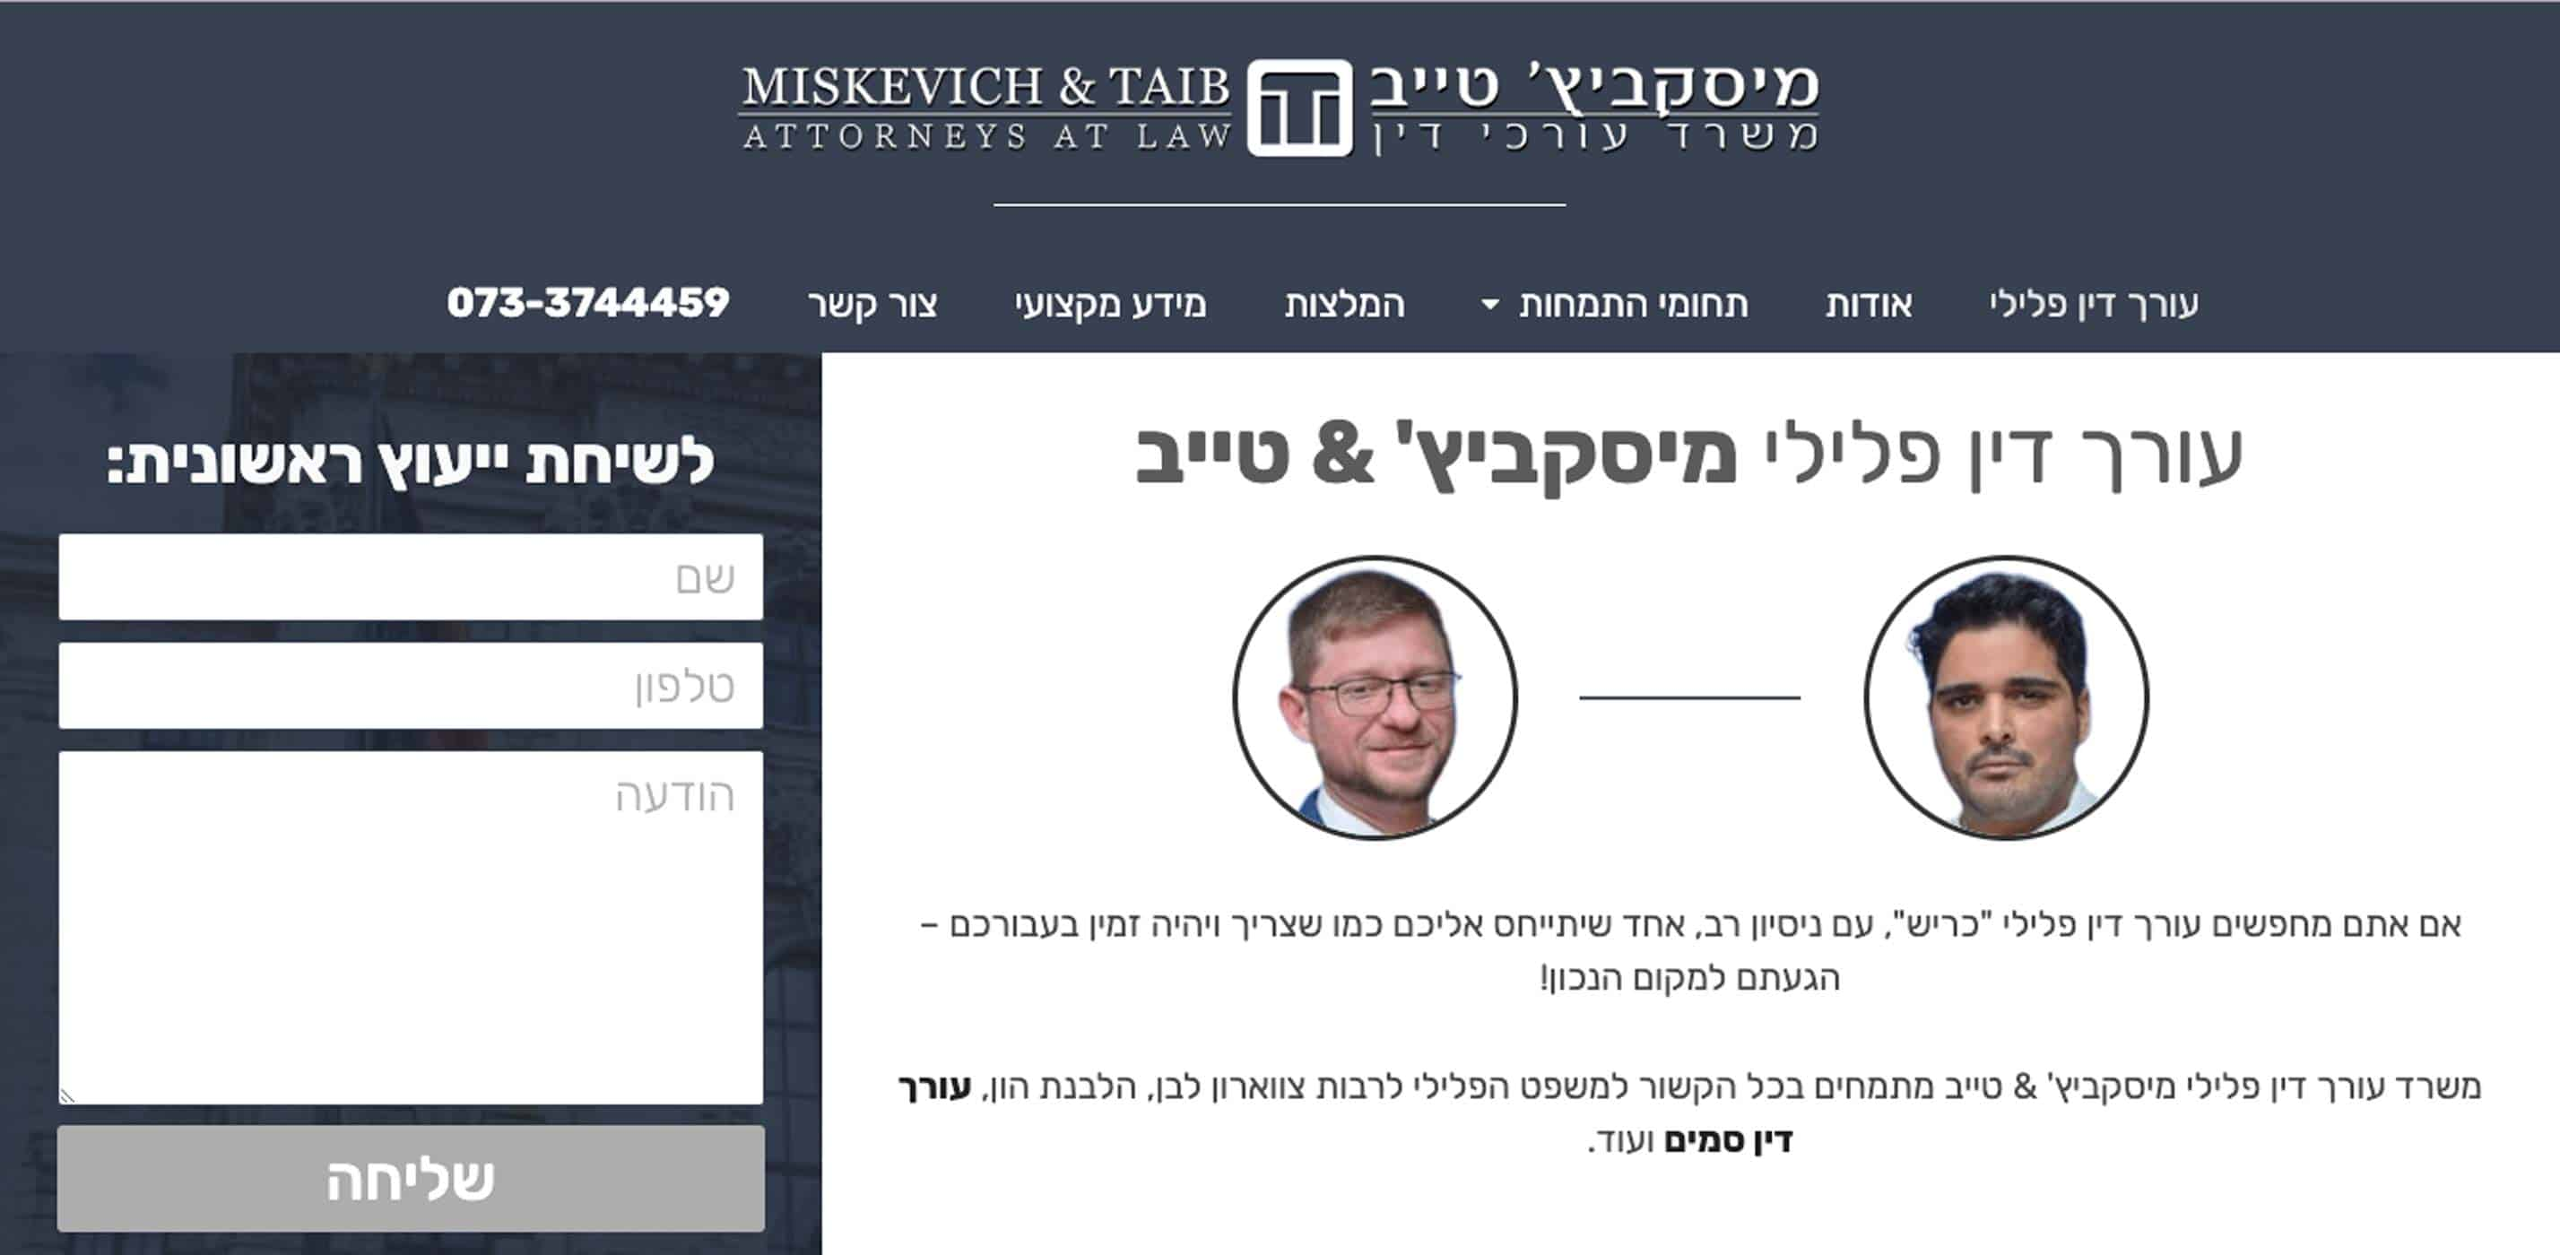 Moskevich&Taib_Web